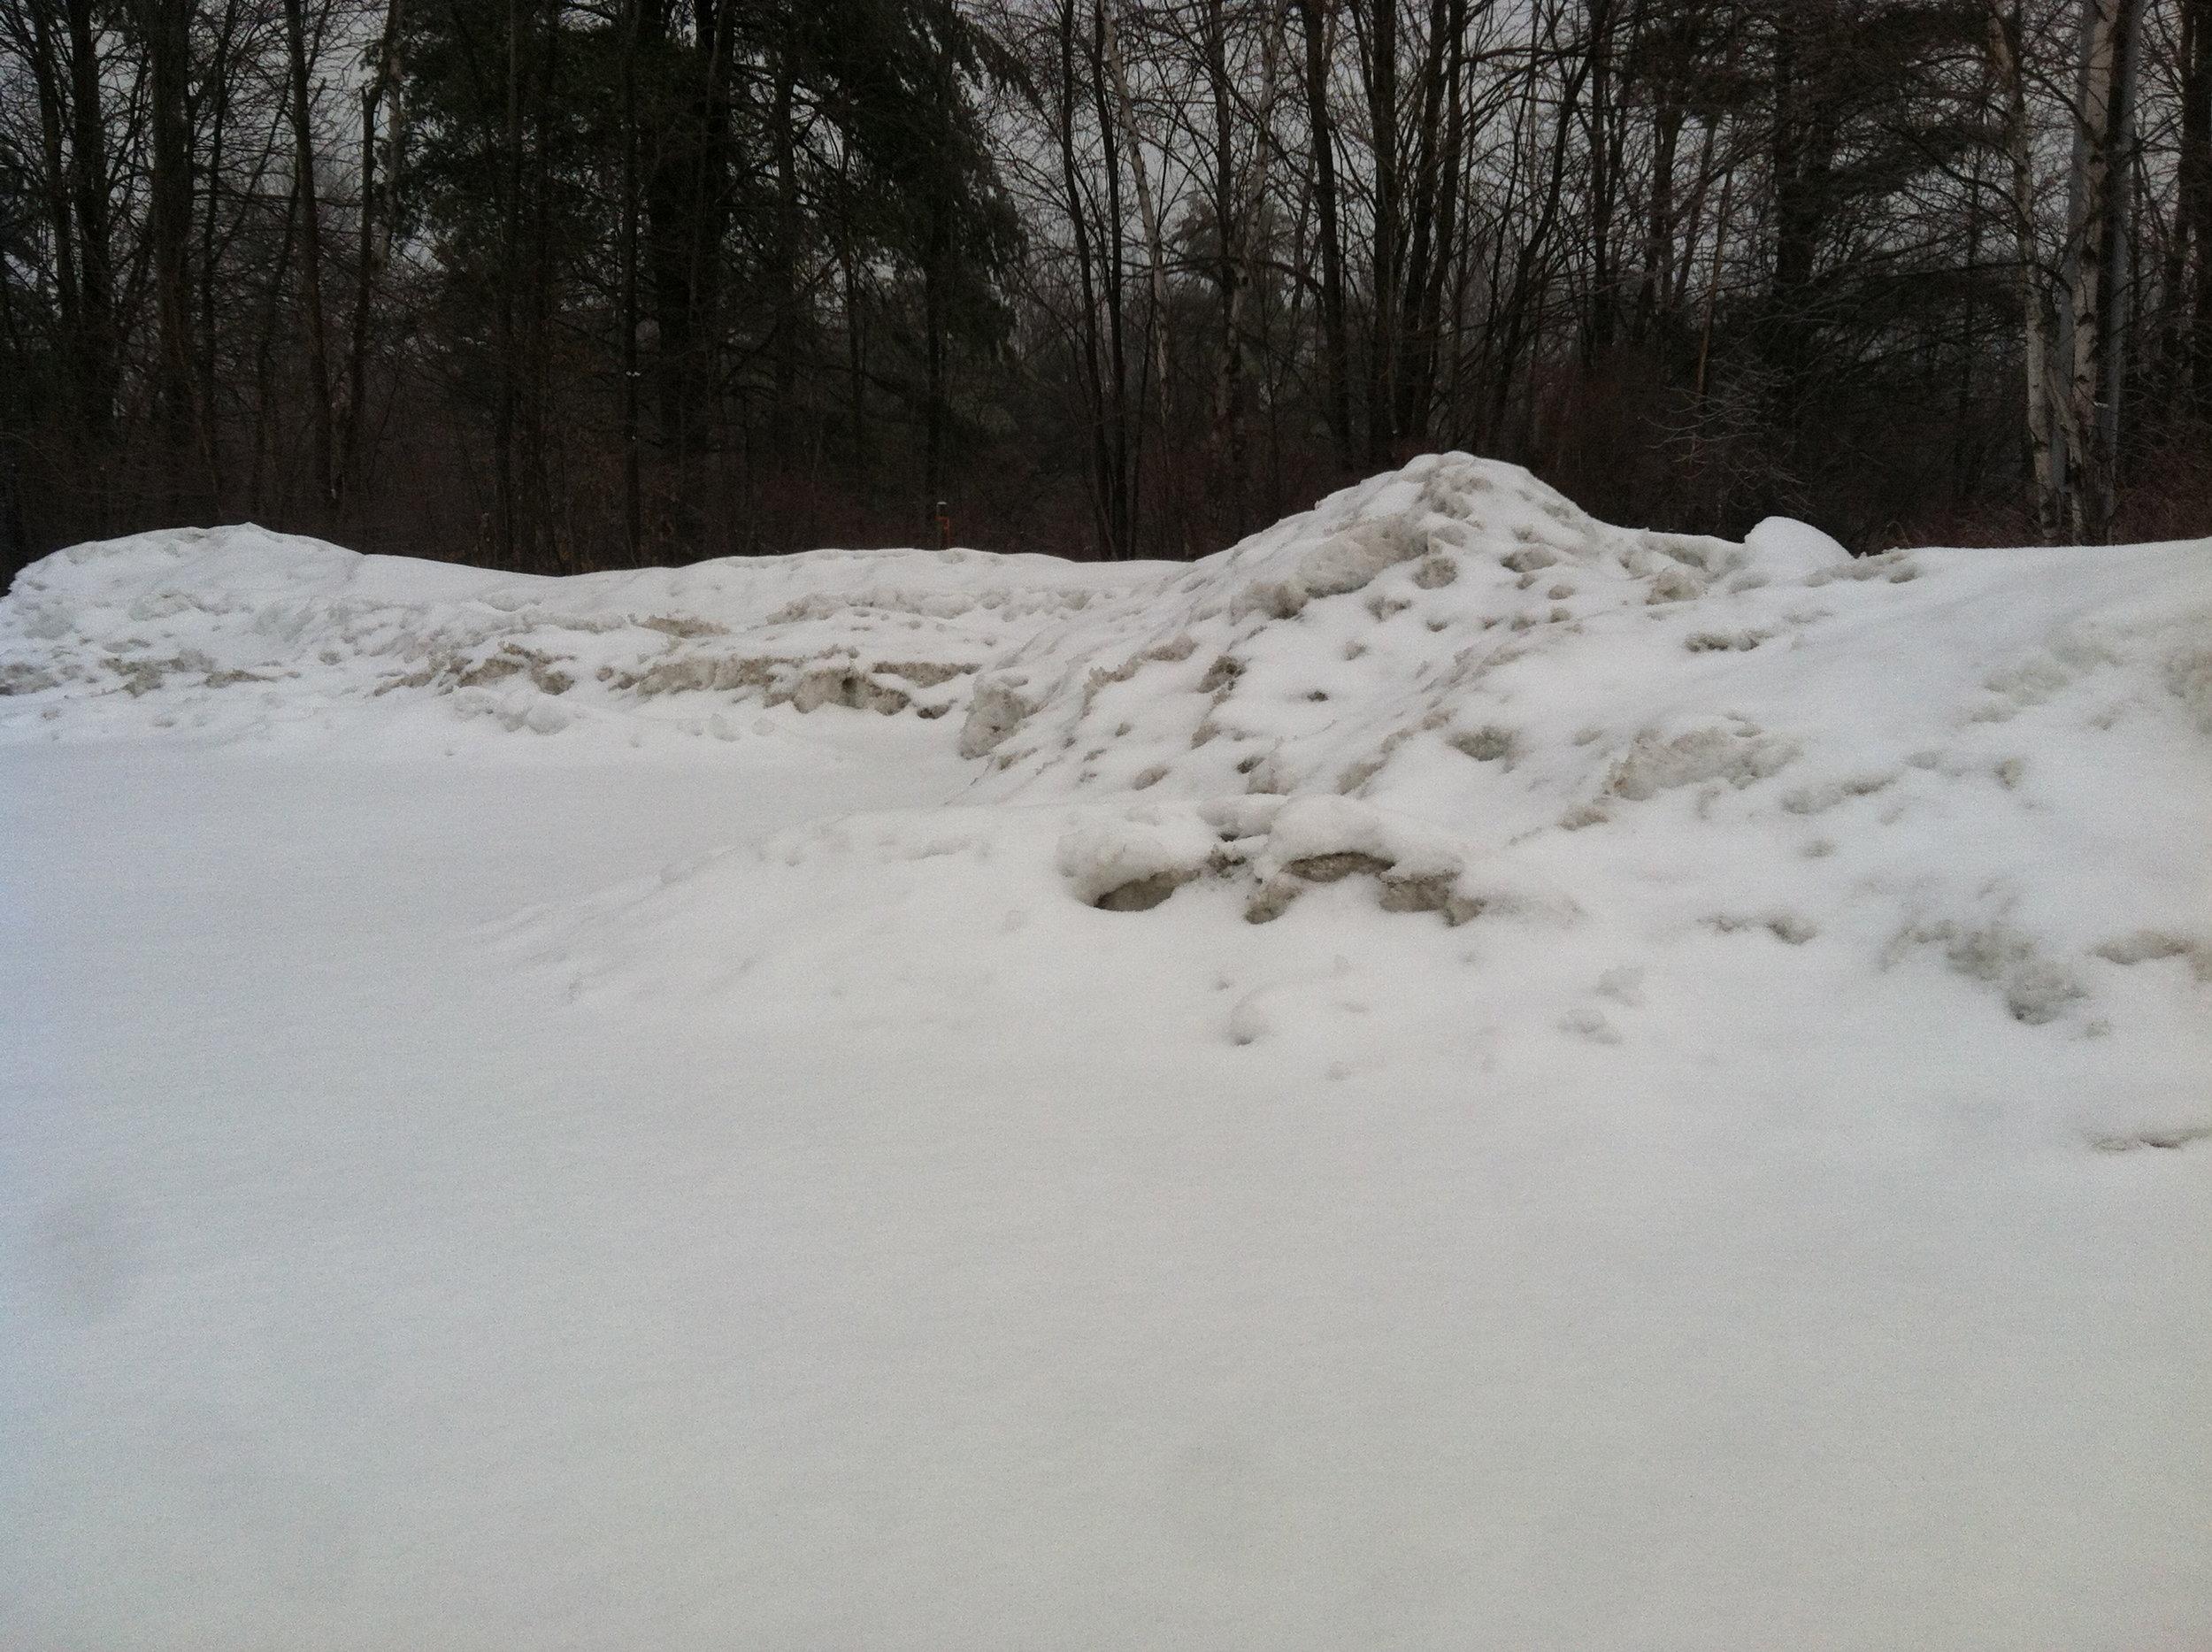 Snow berms: 4-5' high.